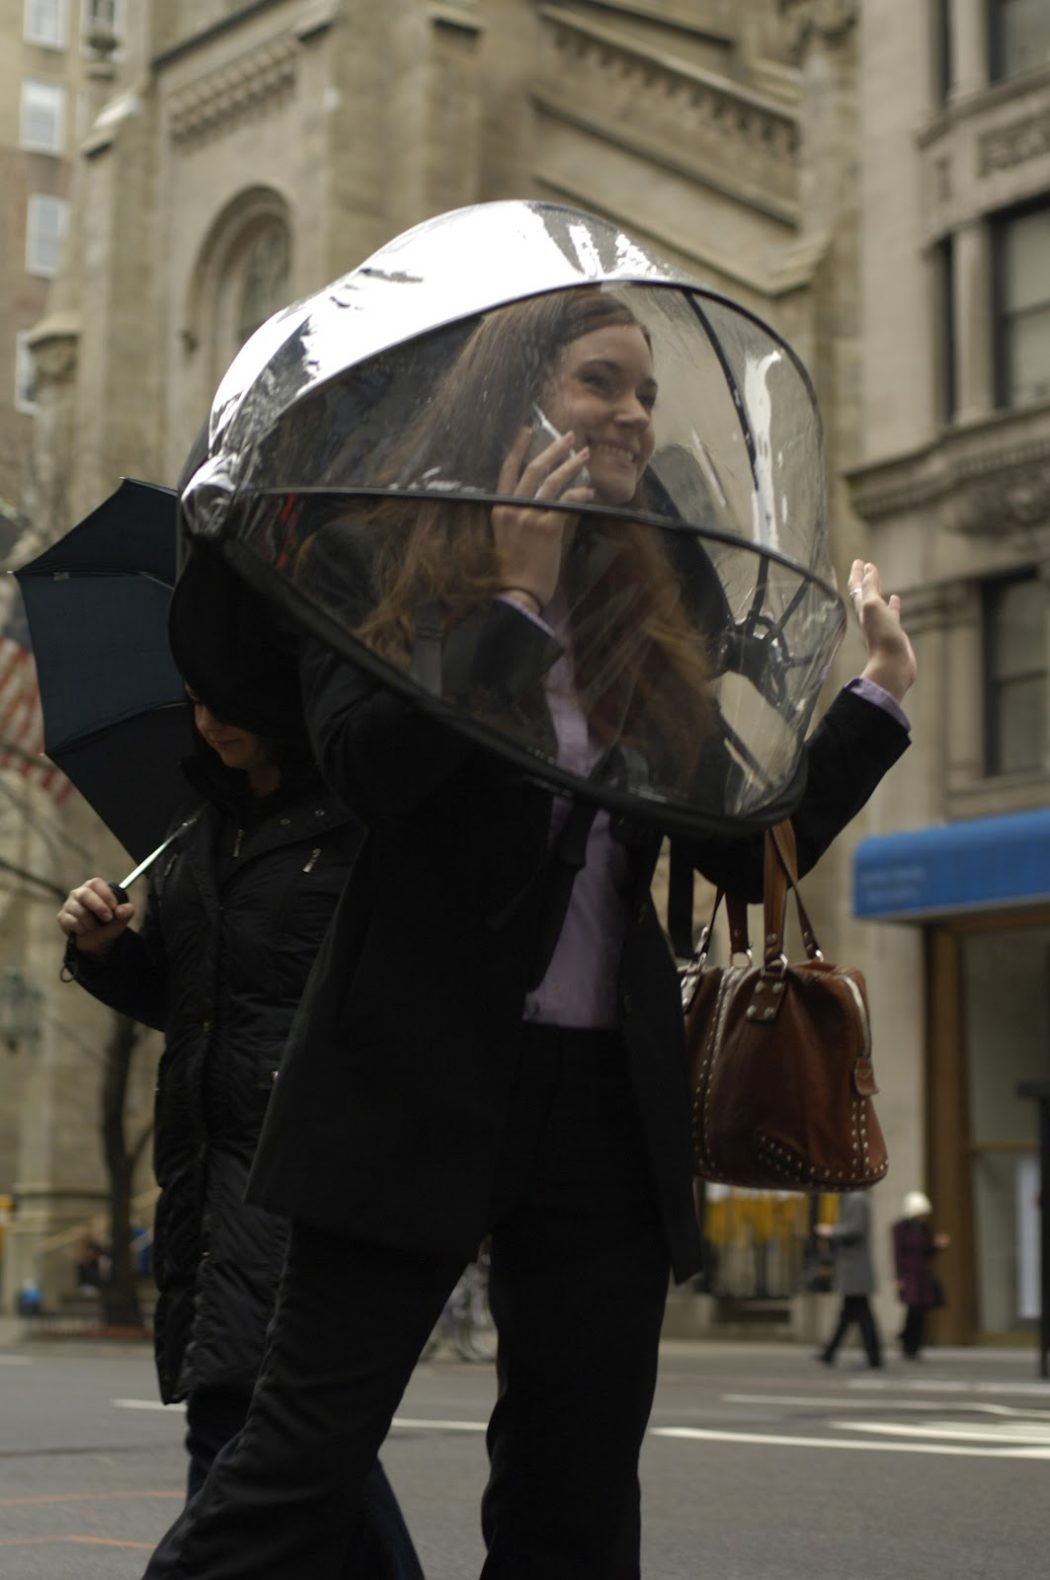 Nubrella3 15 Unusual Umbrellas Design Trends in 2018